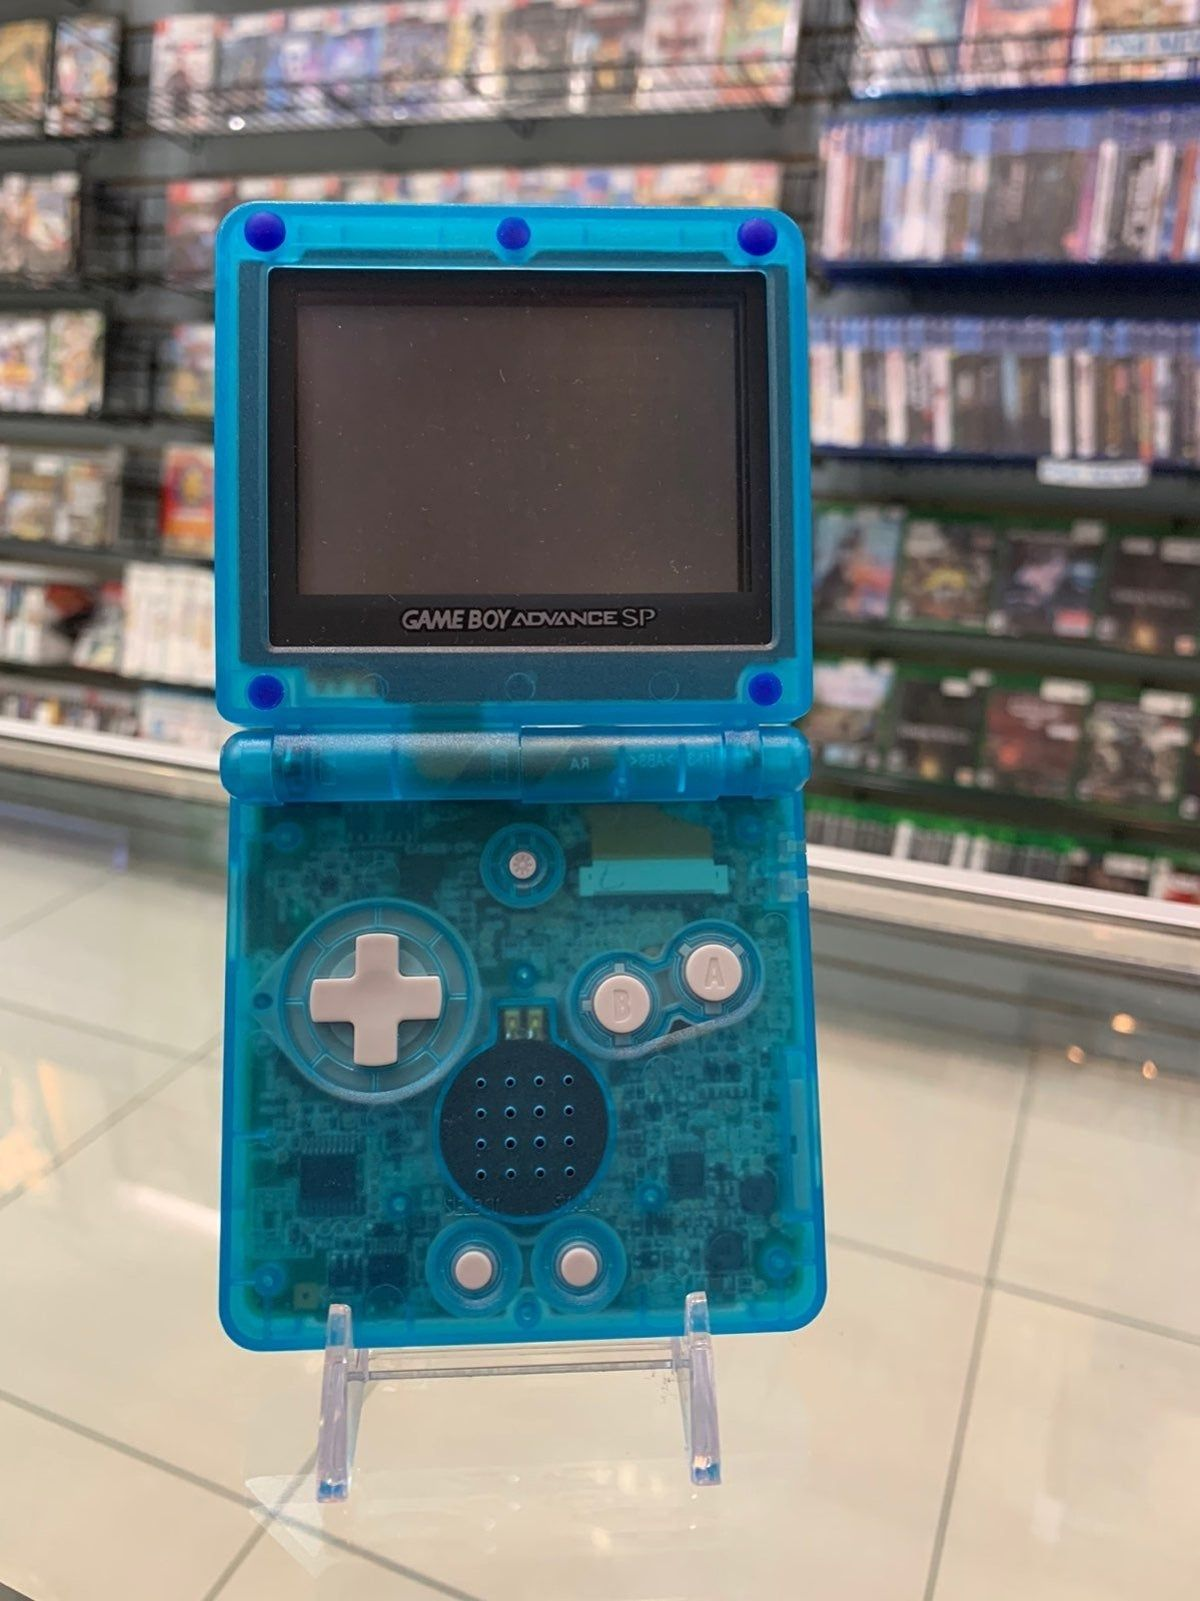 Gameboy Advance Gba Sp Wth Custom Casing Gameboy Gameboy Advance Gameboy Advance Sp